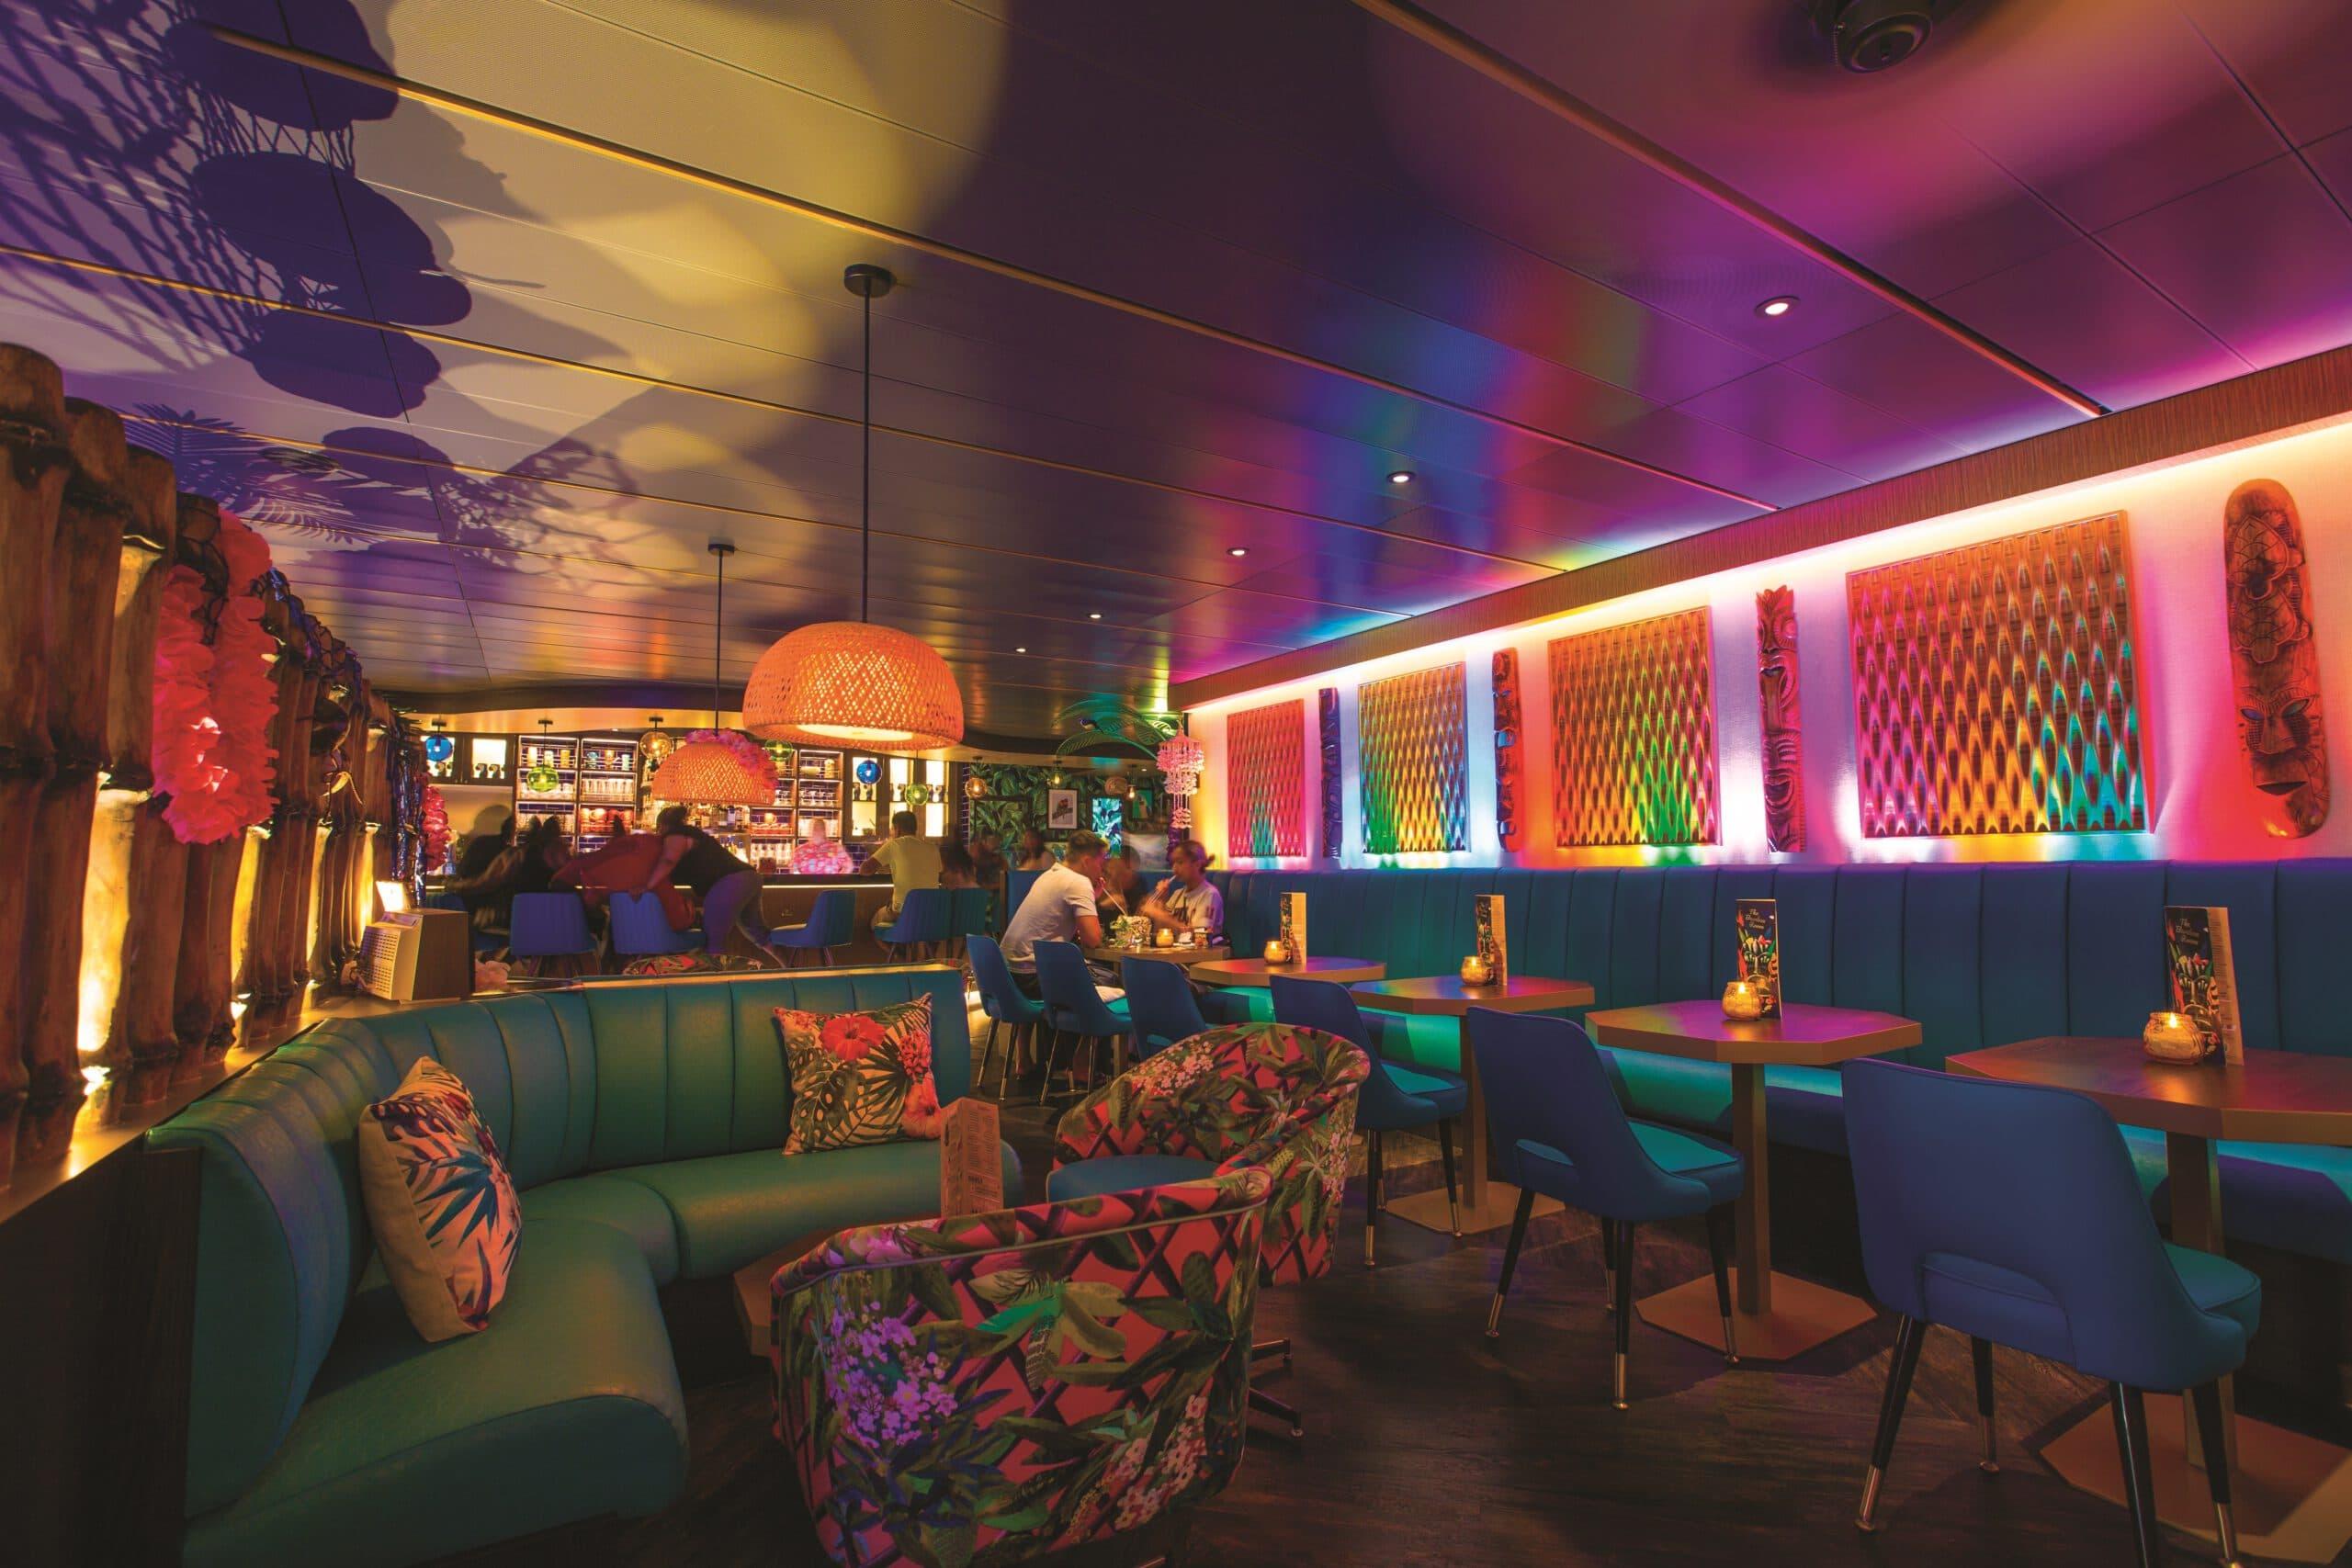 Cruiseschip-Mariner of the Seas-Navigator of the Seas-Royal Caribbean International-Bar Lounge